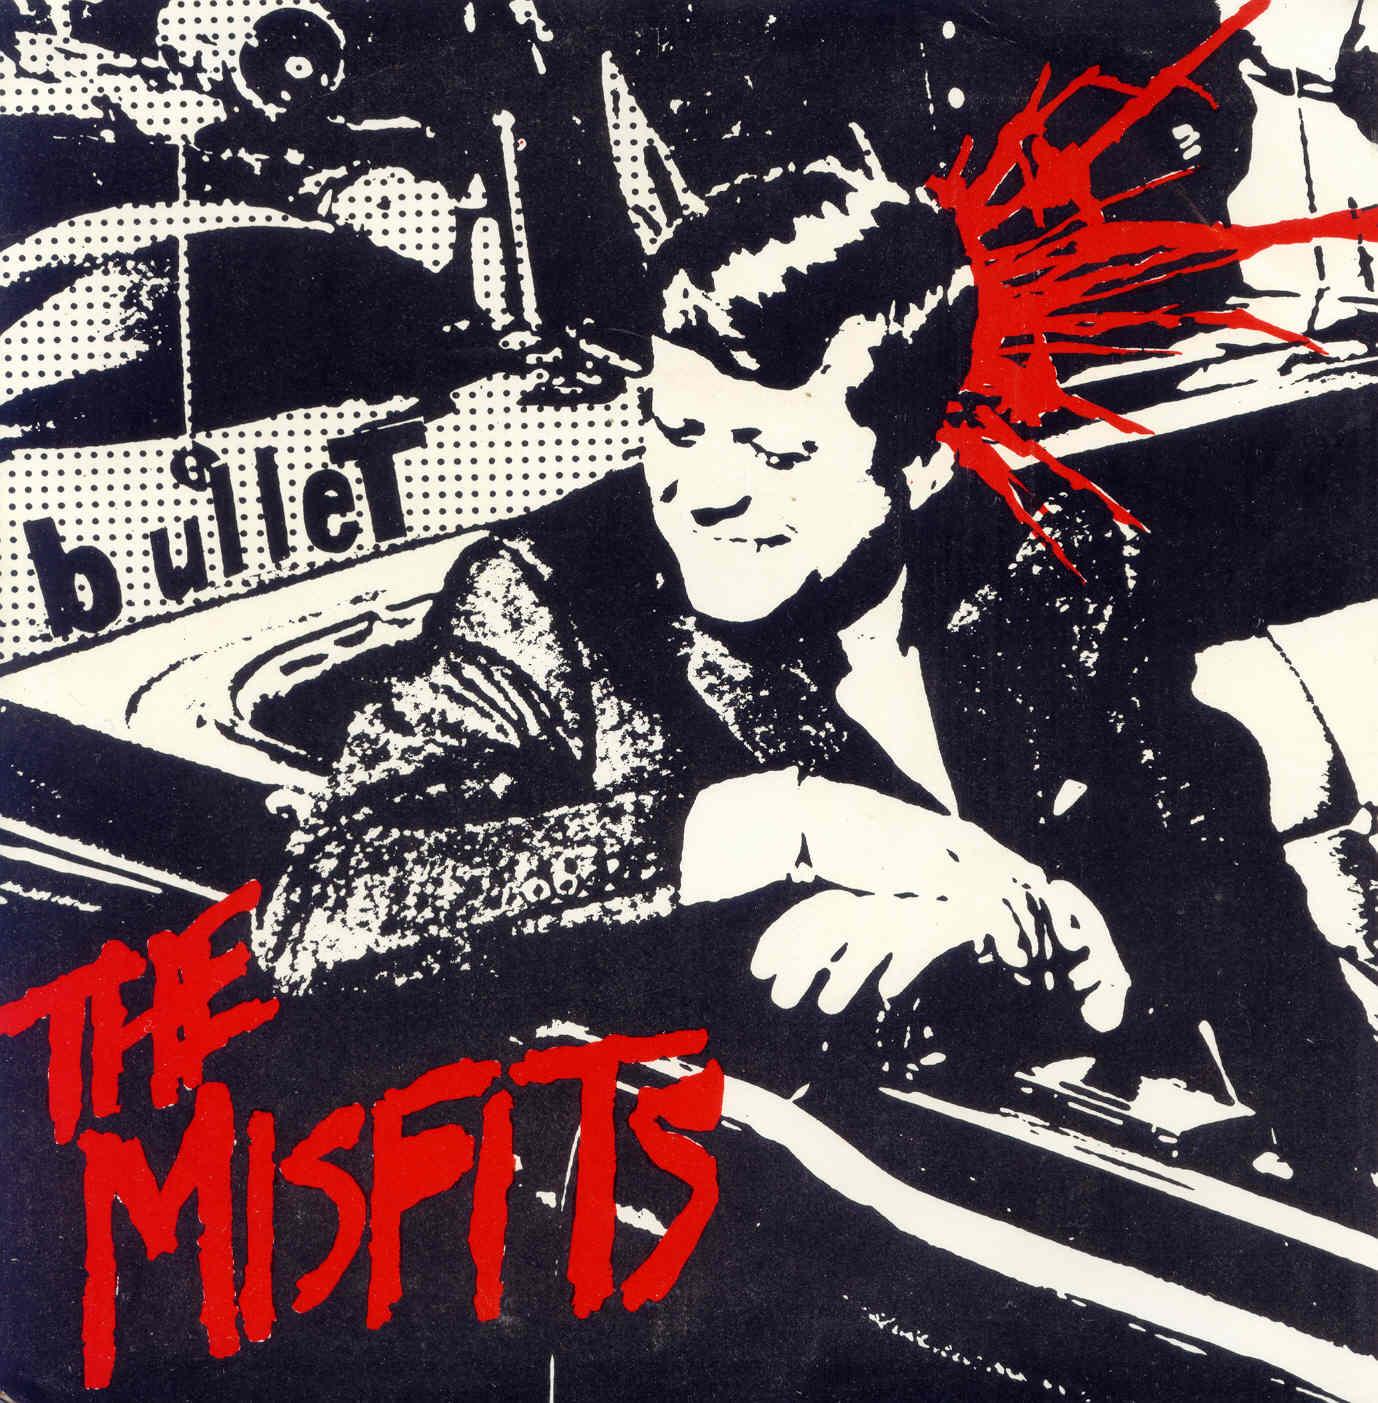 Misfits / Danzig Reunion - image 7 - student project